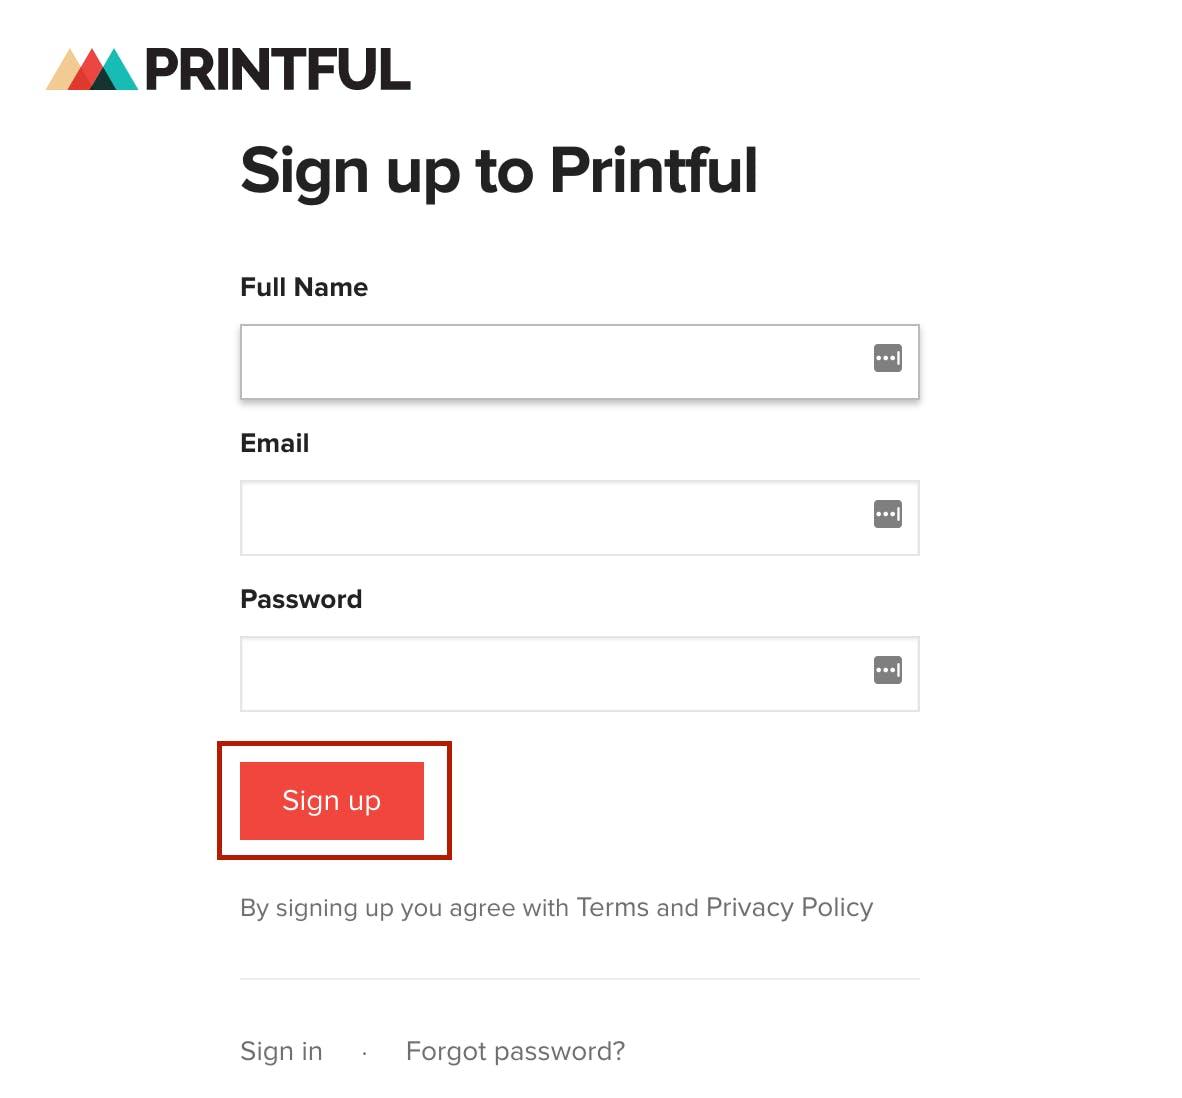 Sign up Printful